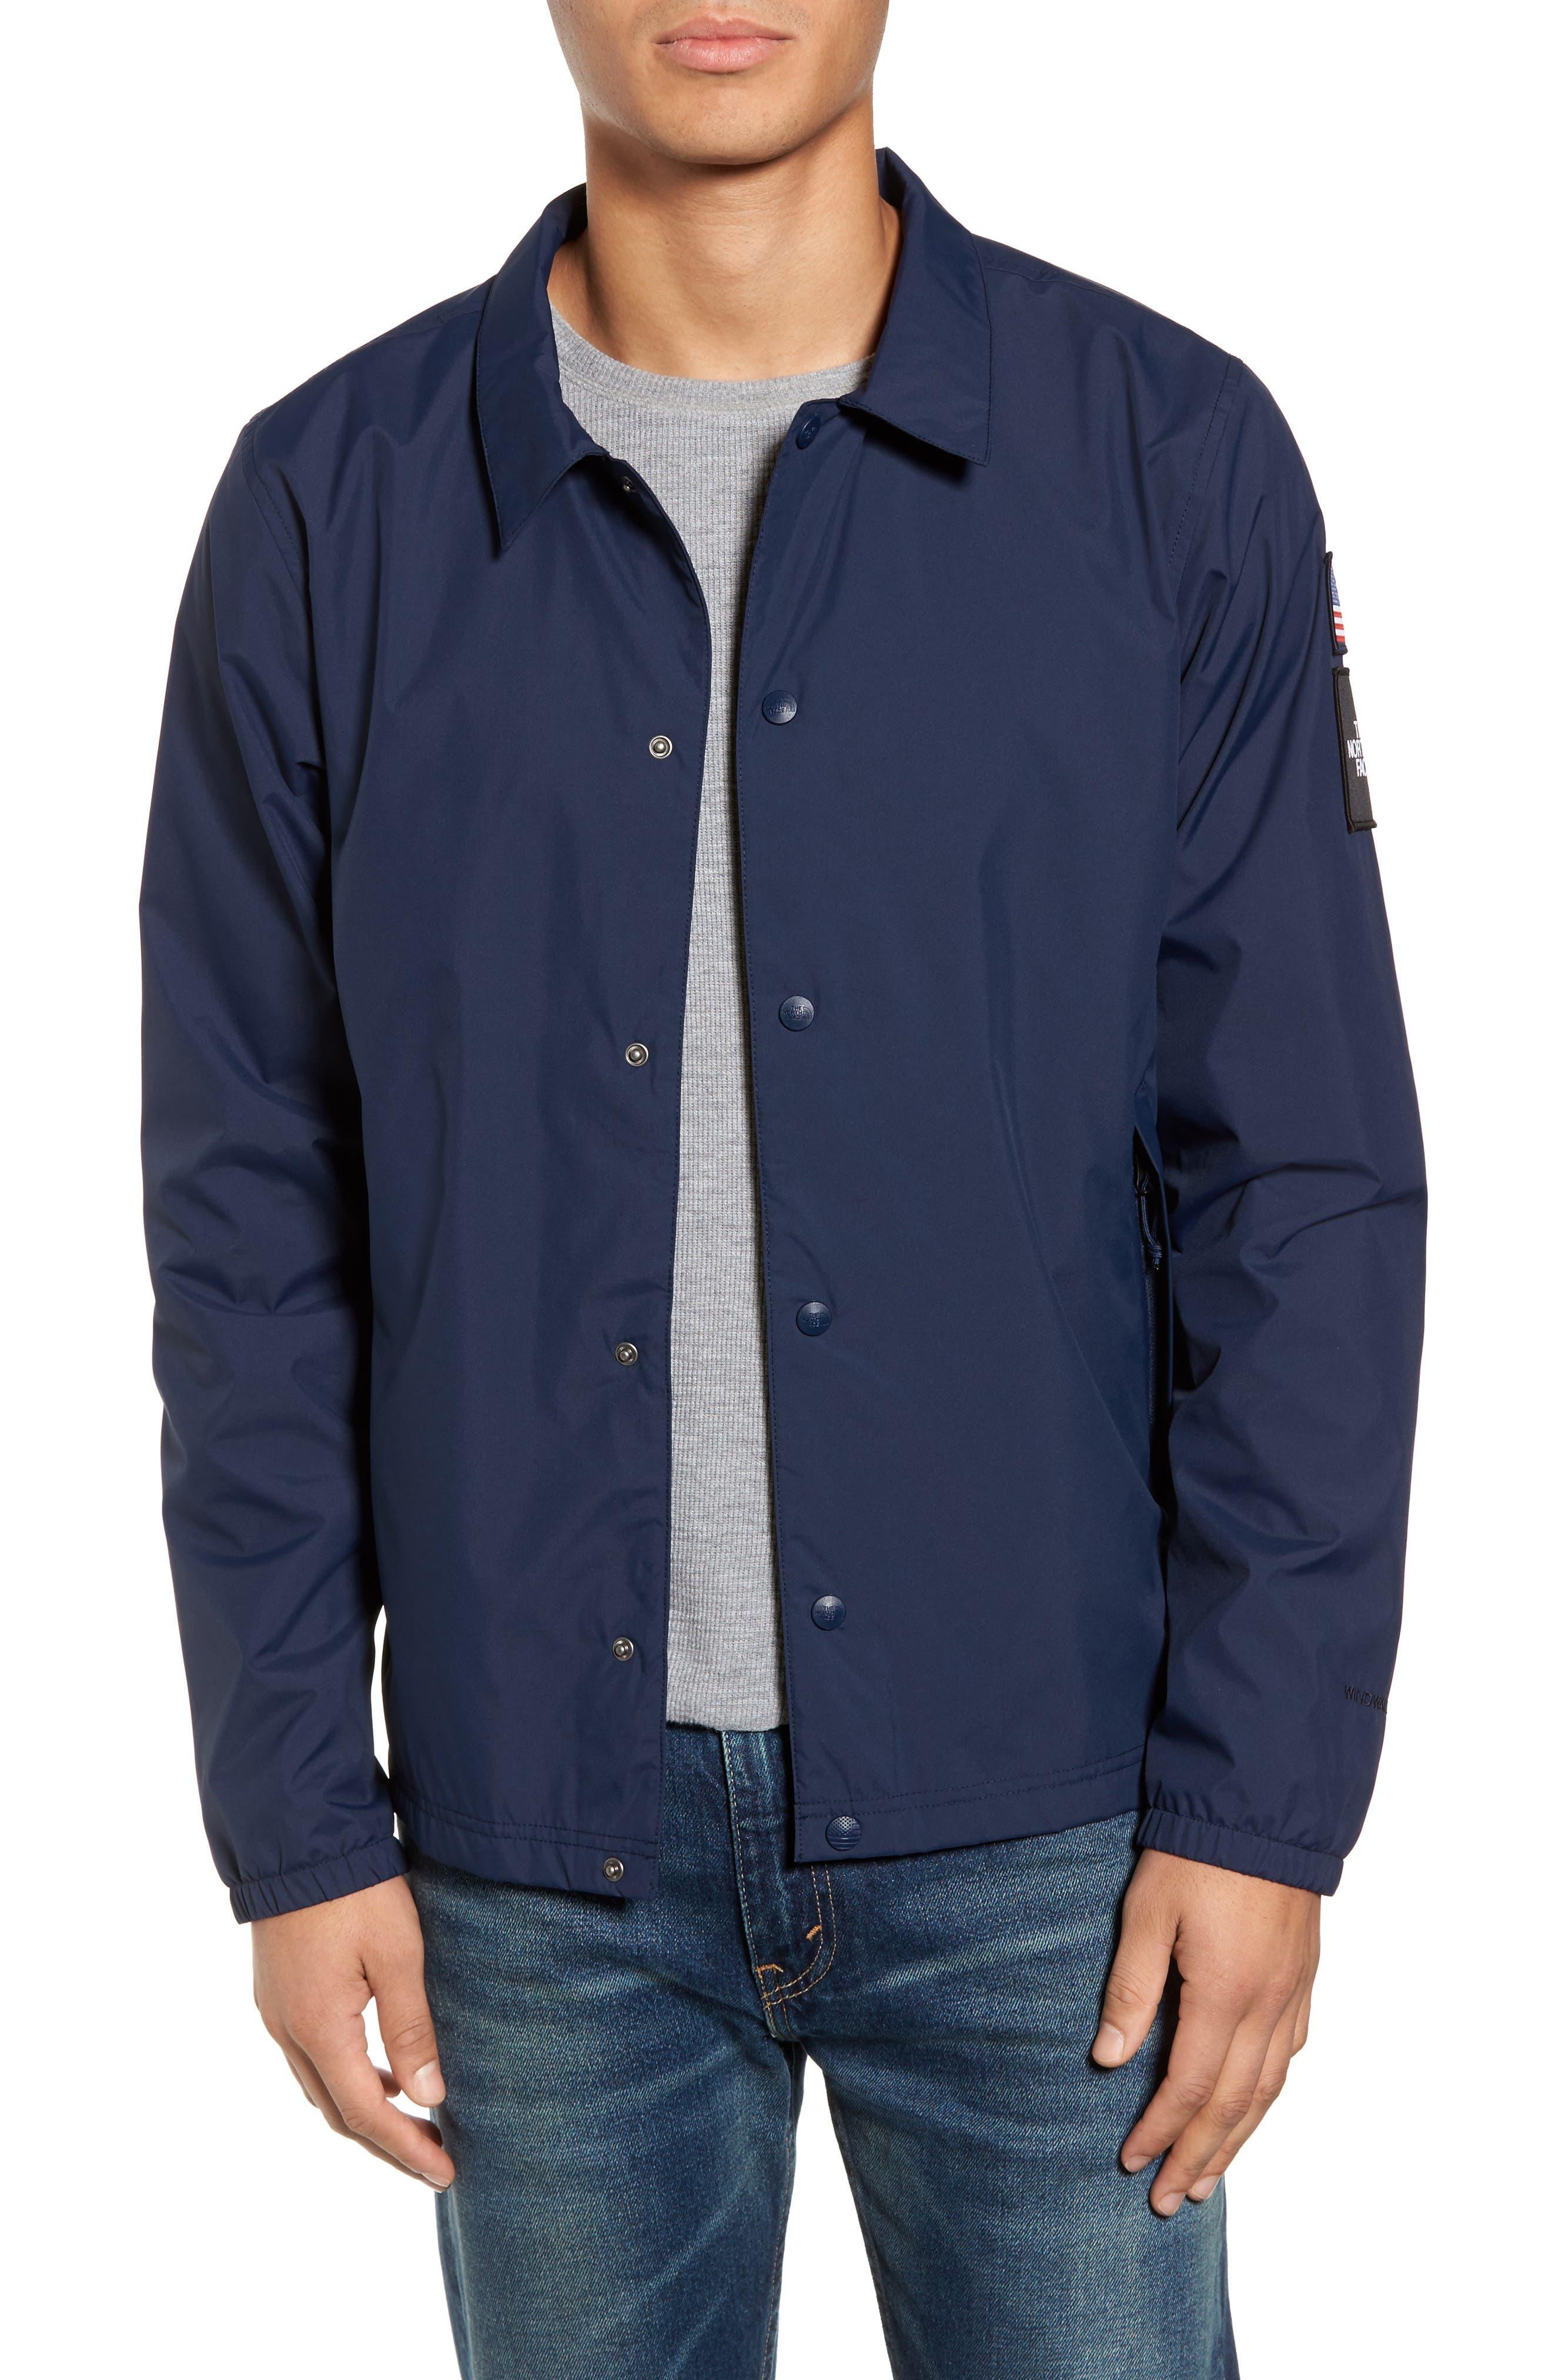 International Collection Coach Jacket,                             Main thumbnail 3, color,